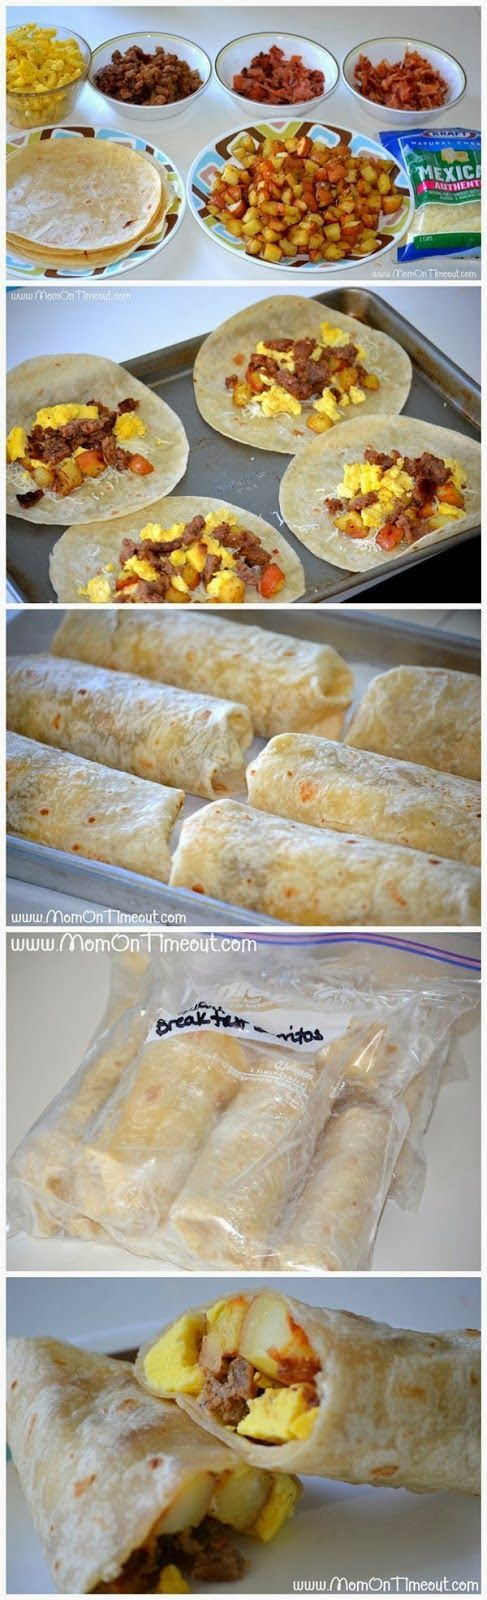 Breakfast Burrito Bonanza – A Freezer Meal Idea Recipe